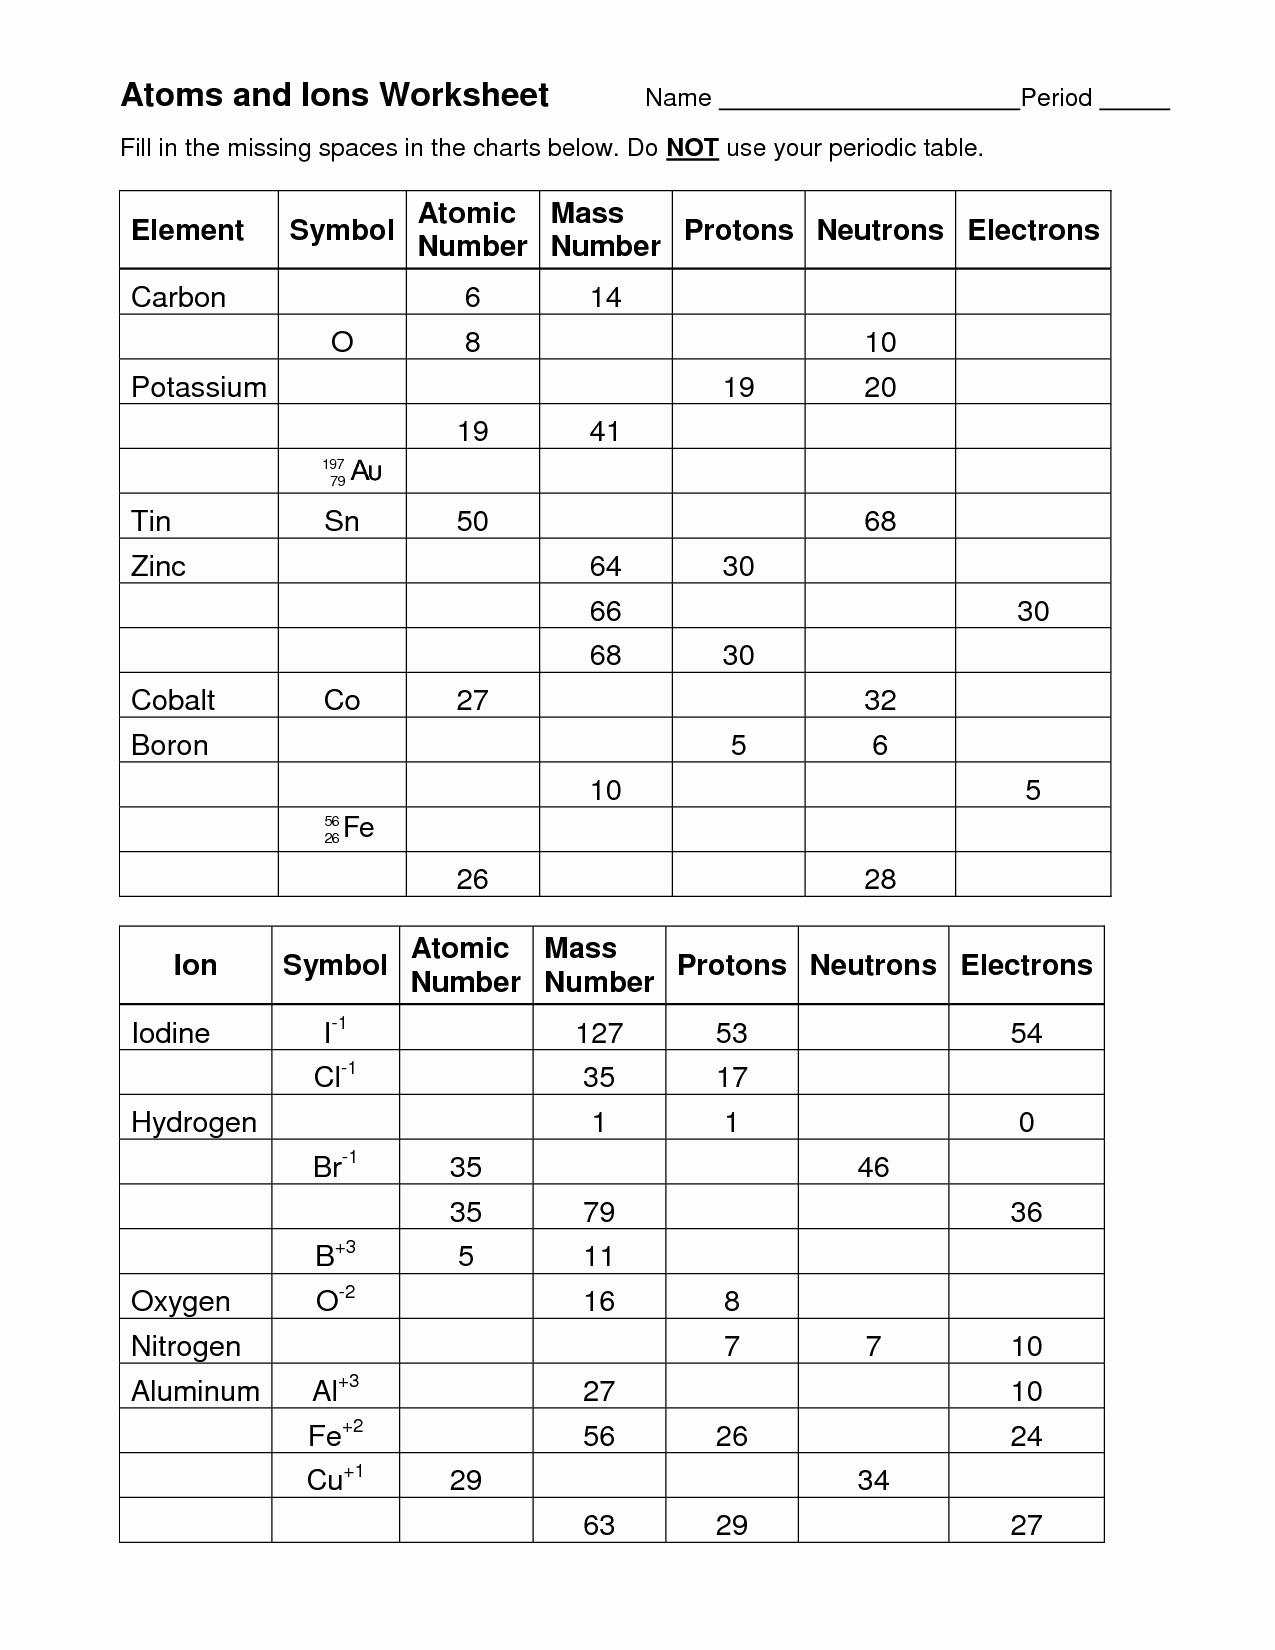 Atoms and isotopes Worksheet Answers Luxury 13 Best Of Element Symbols Worksheet Answer Key